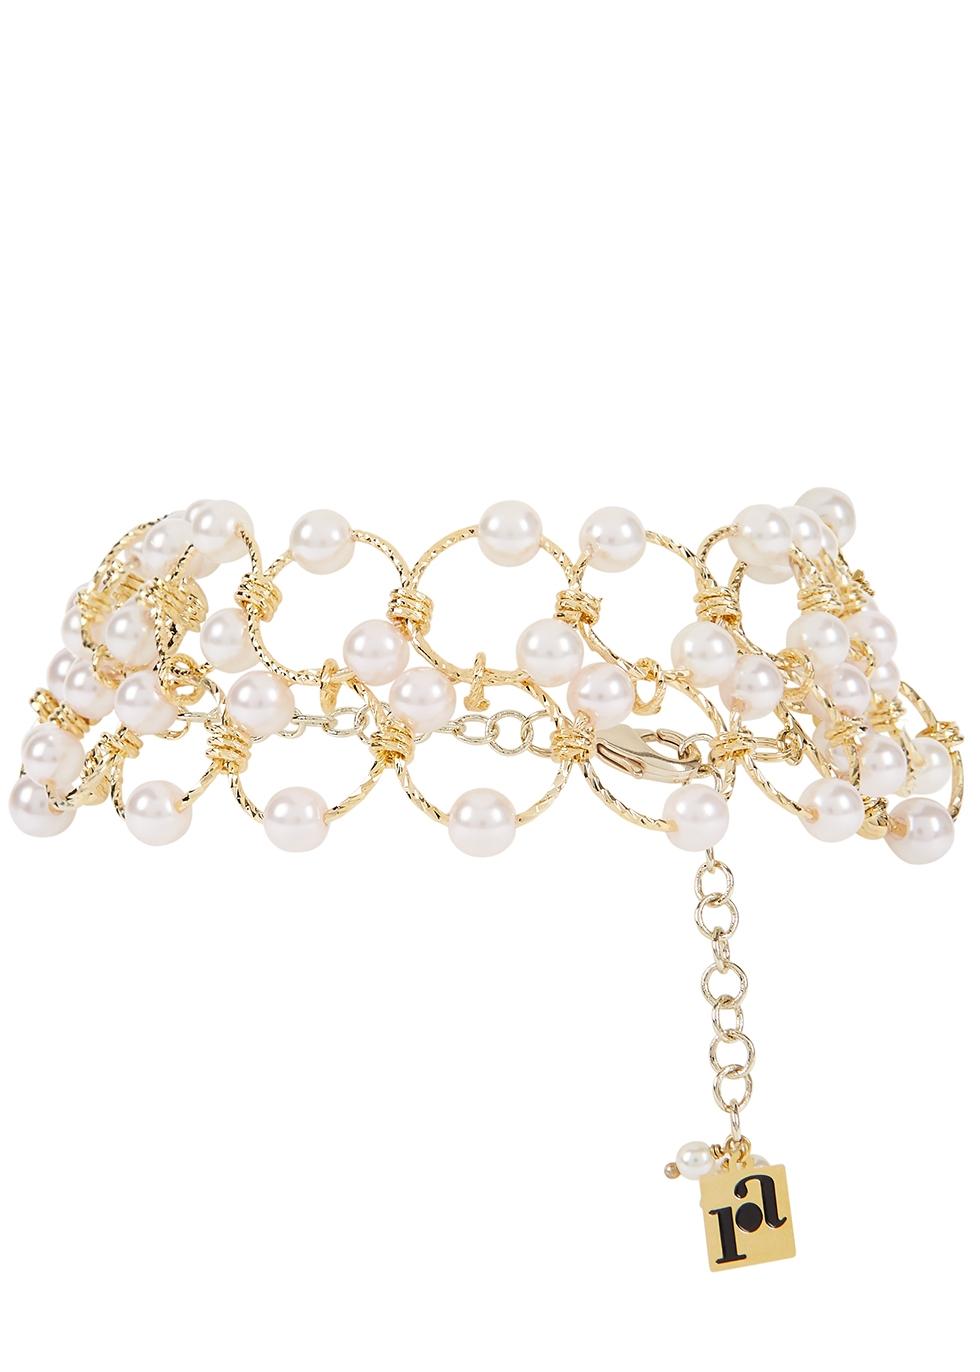 Siviglia embellished gold-tone choker